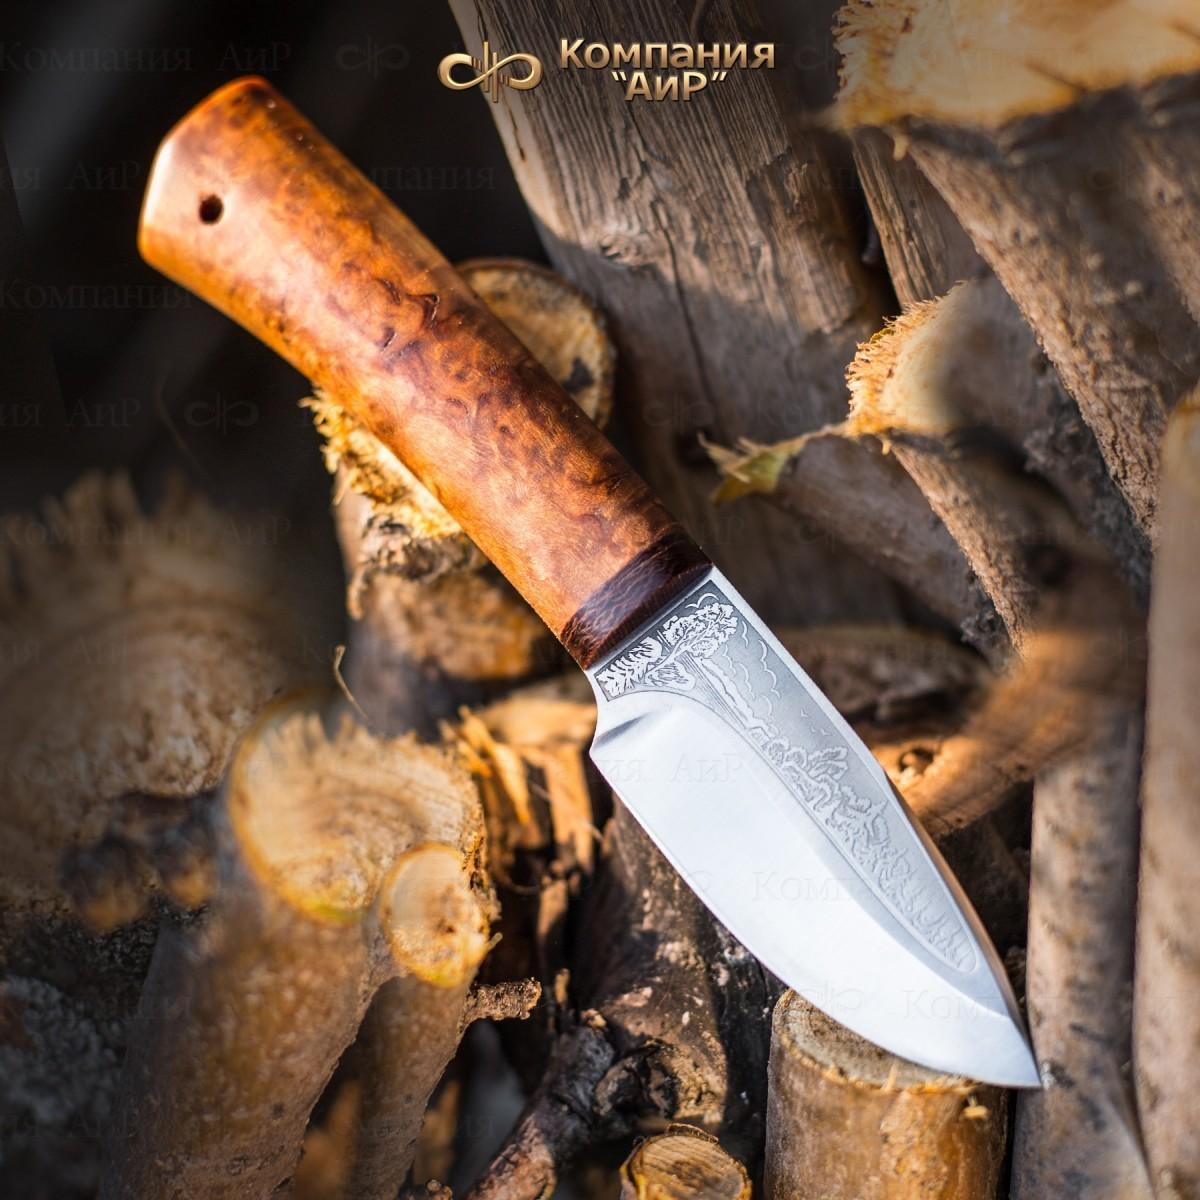 Нож разделочный АиР Добрый, сталь 100х13м, рукоять карельская береза нож разделочный скинер карельская береза 100х13м аир